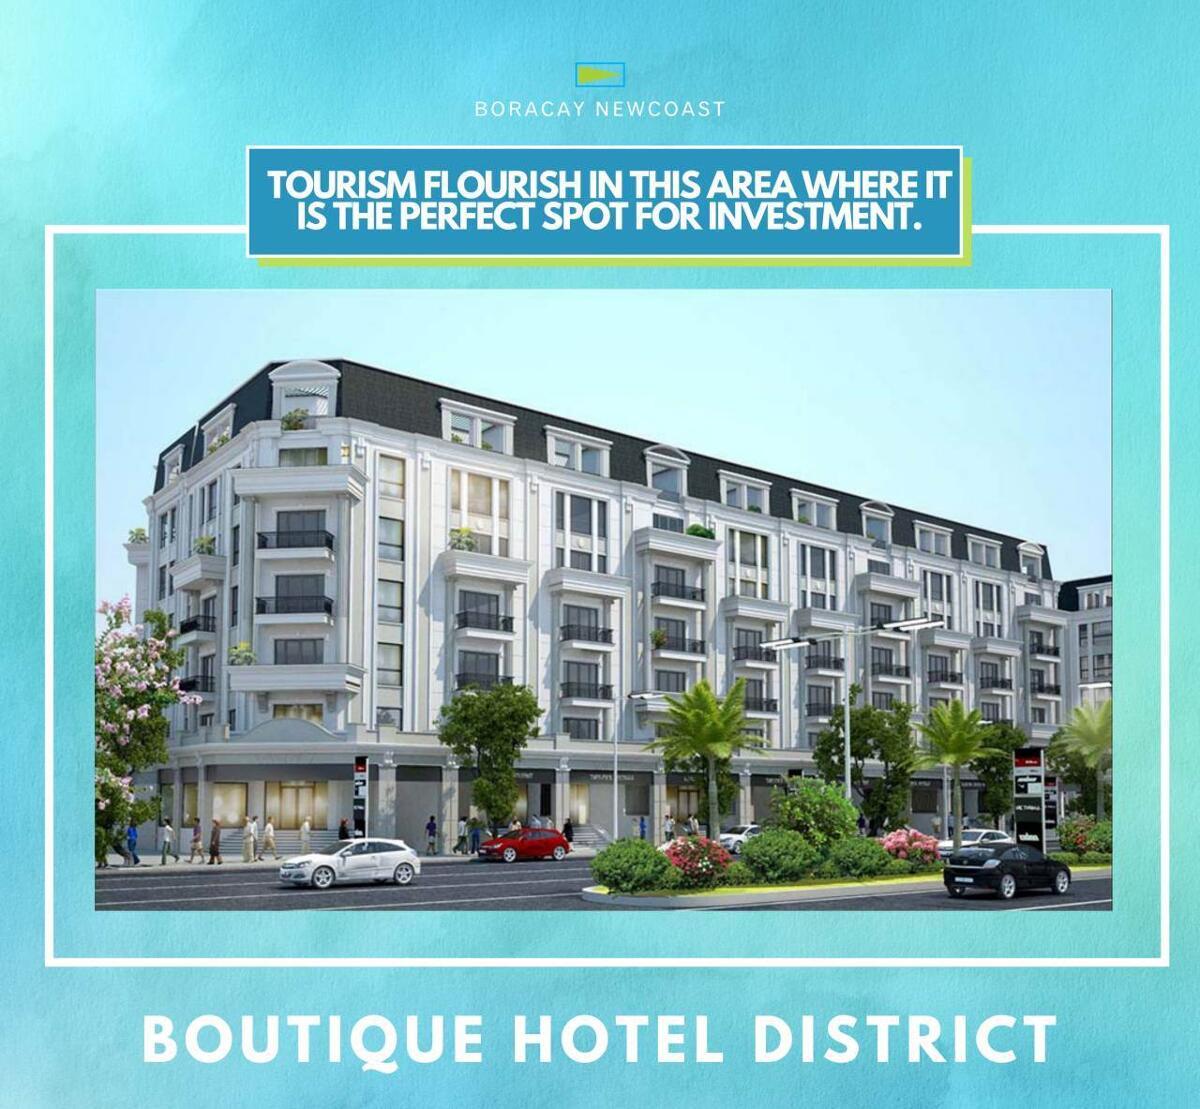 Boracay Newcoast Boutique Hotel Plan